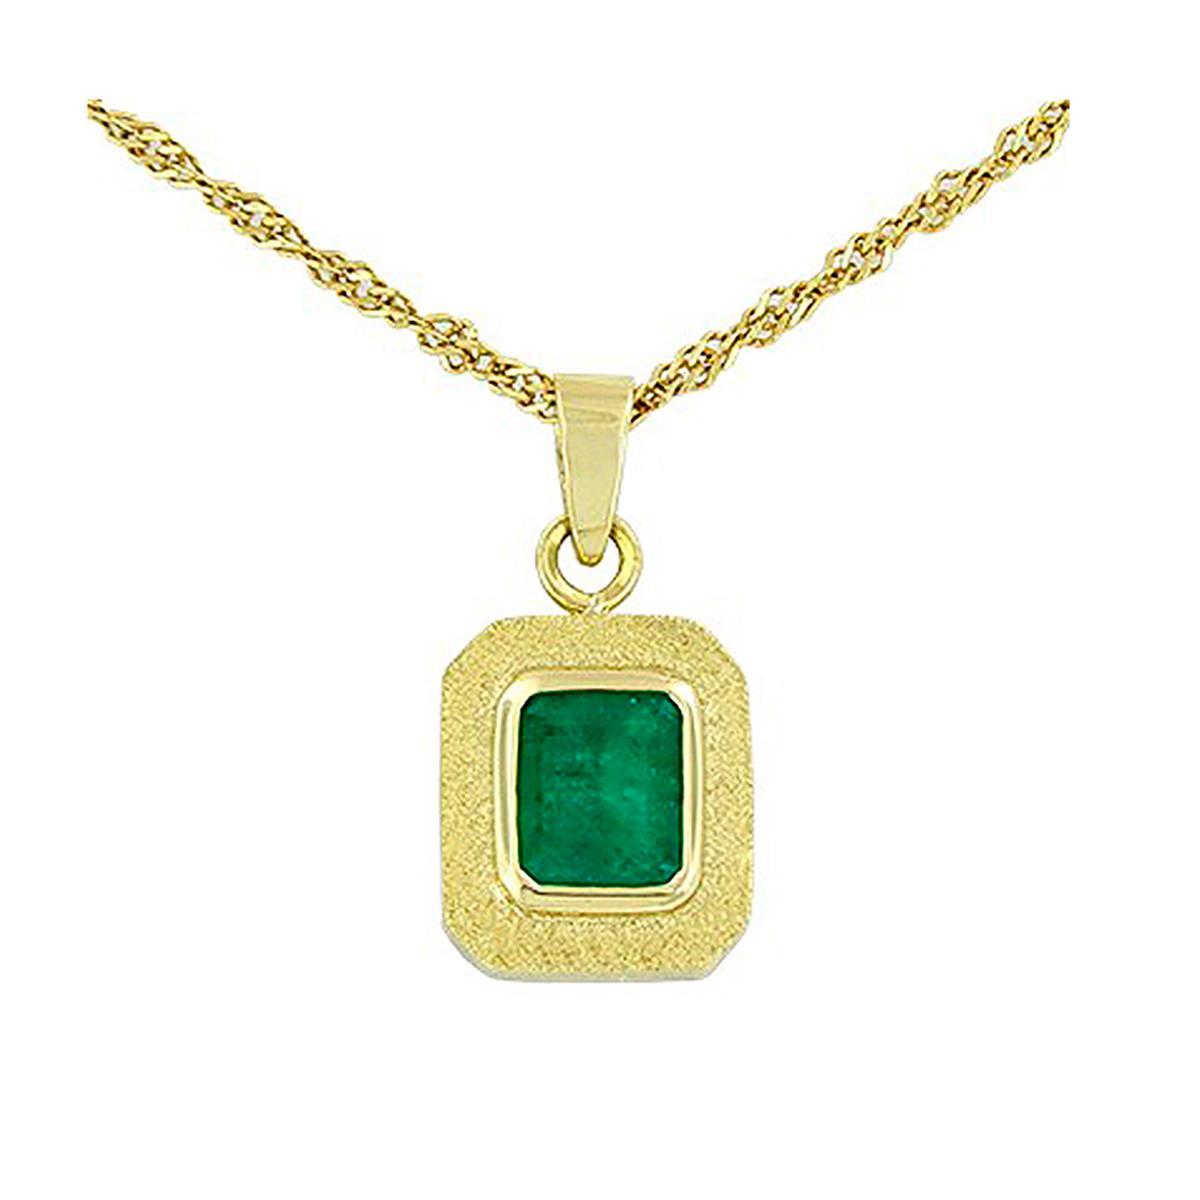 emerald-cut-emerald-pendant-in-18k-yellow-gold-bezel-setting